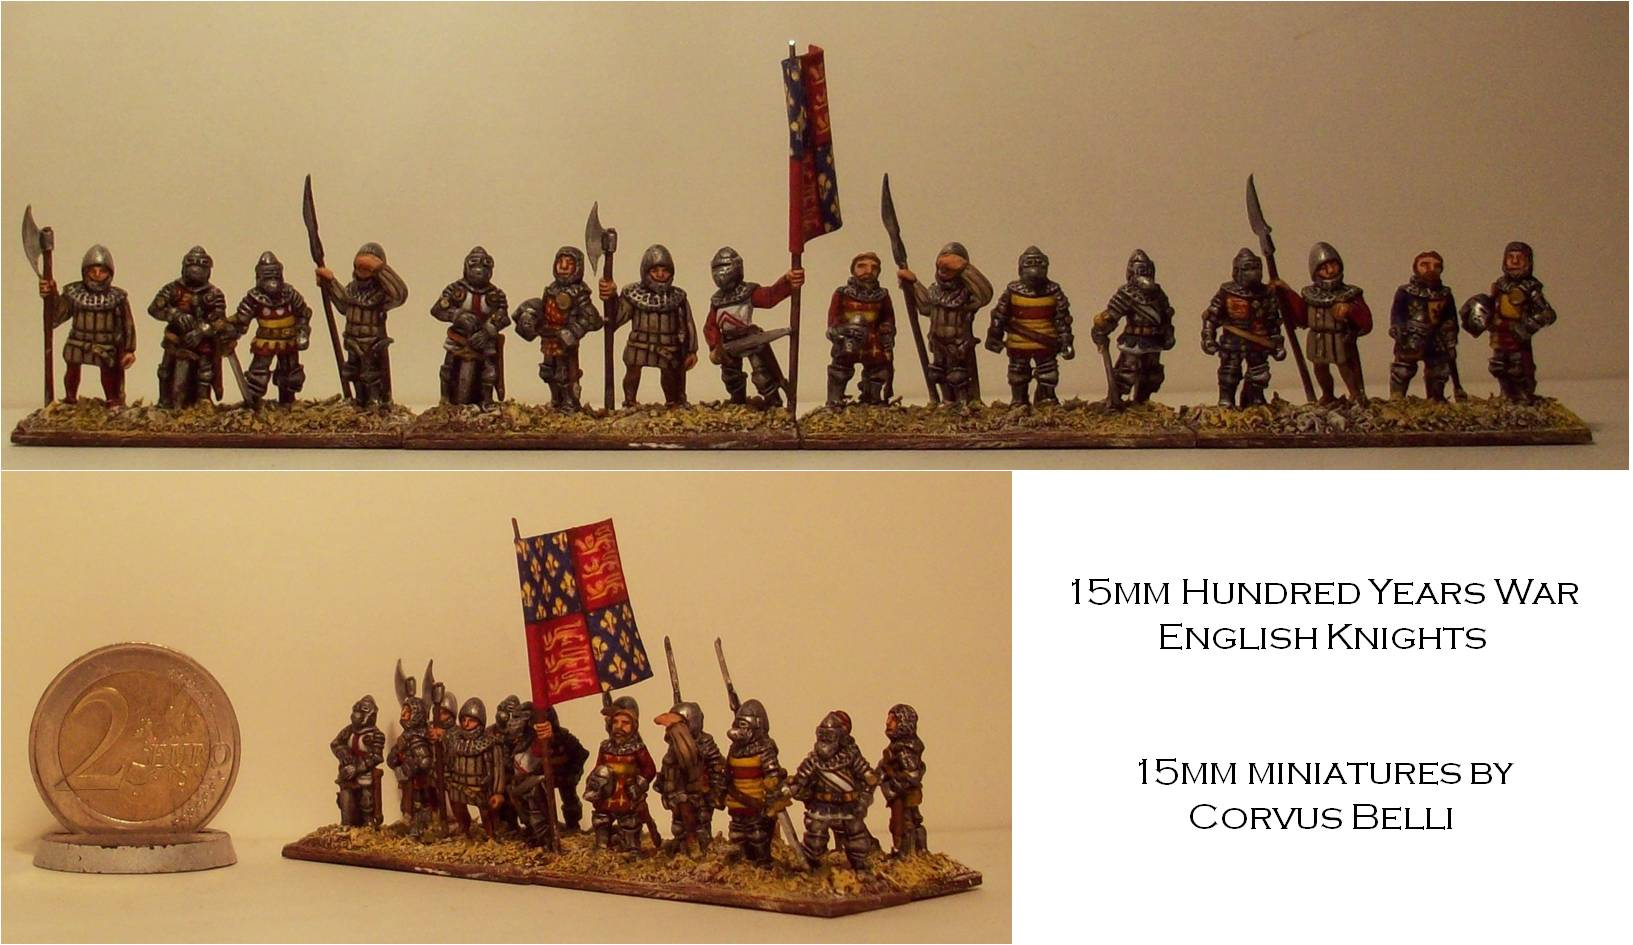 15mm Hundred Years War English knights